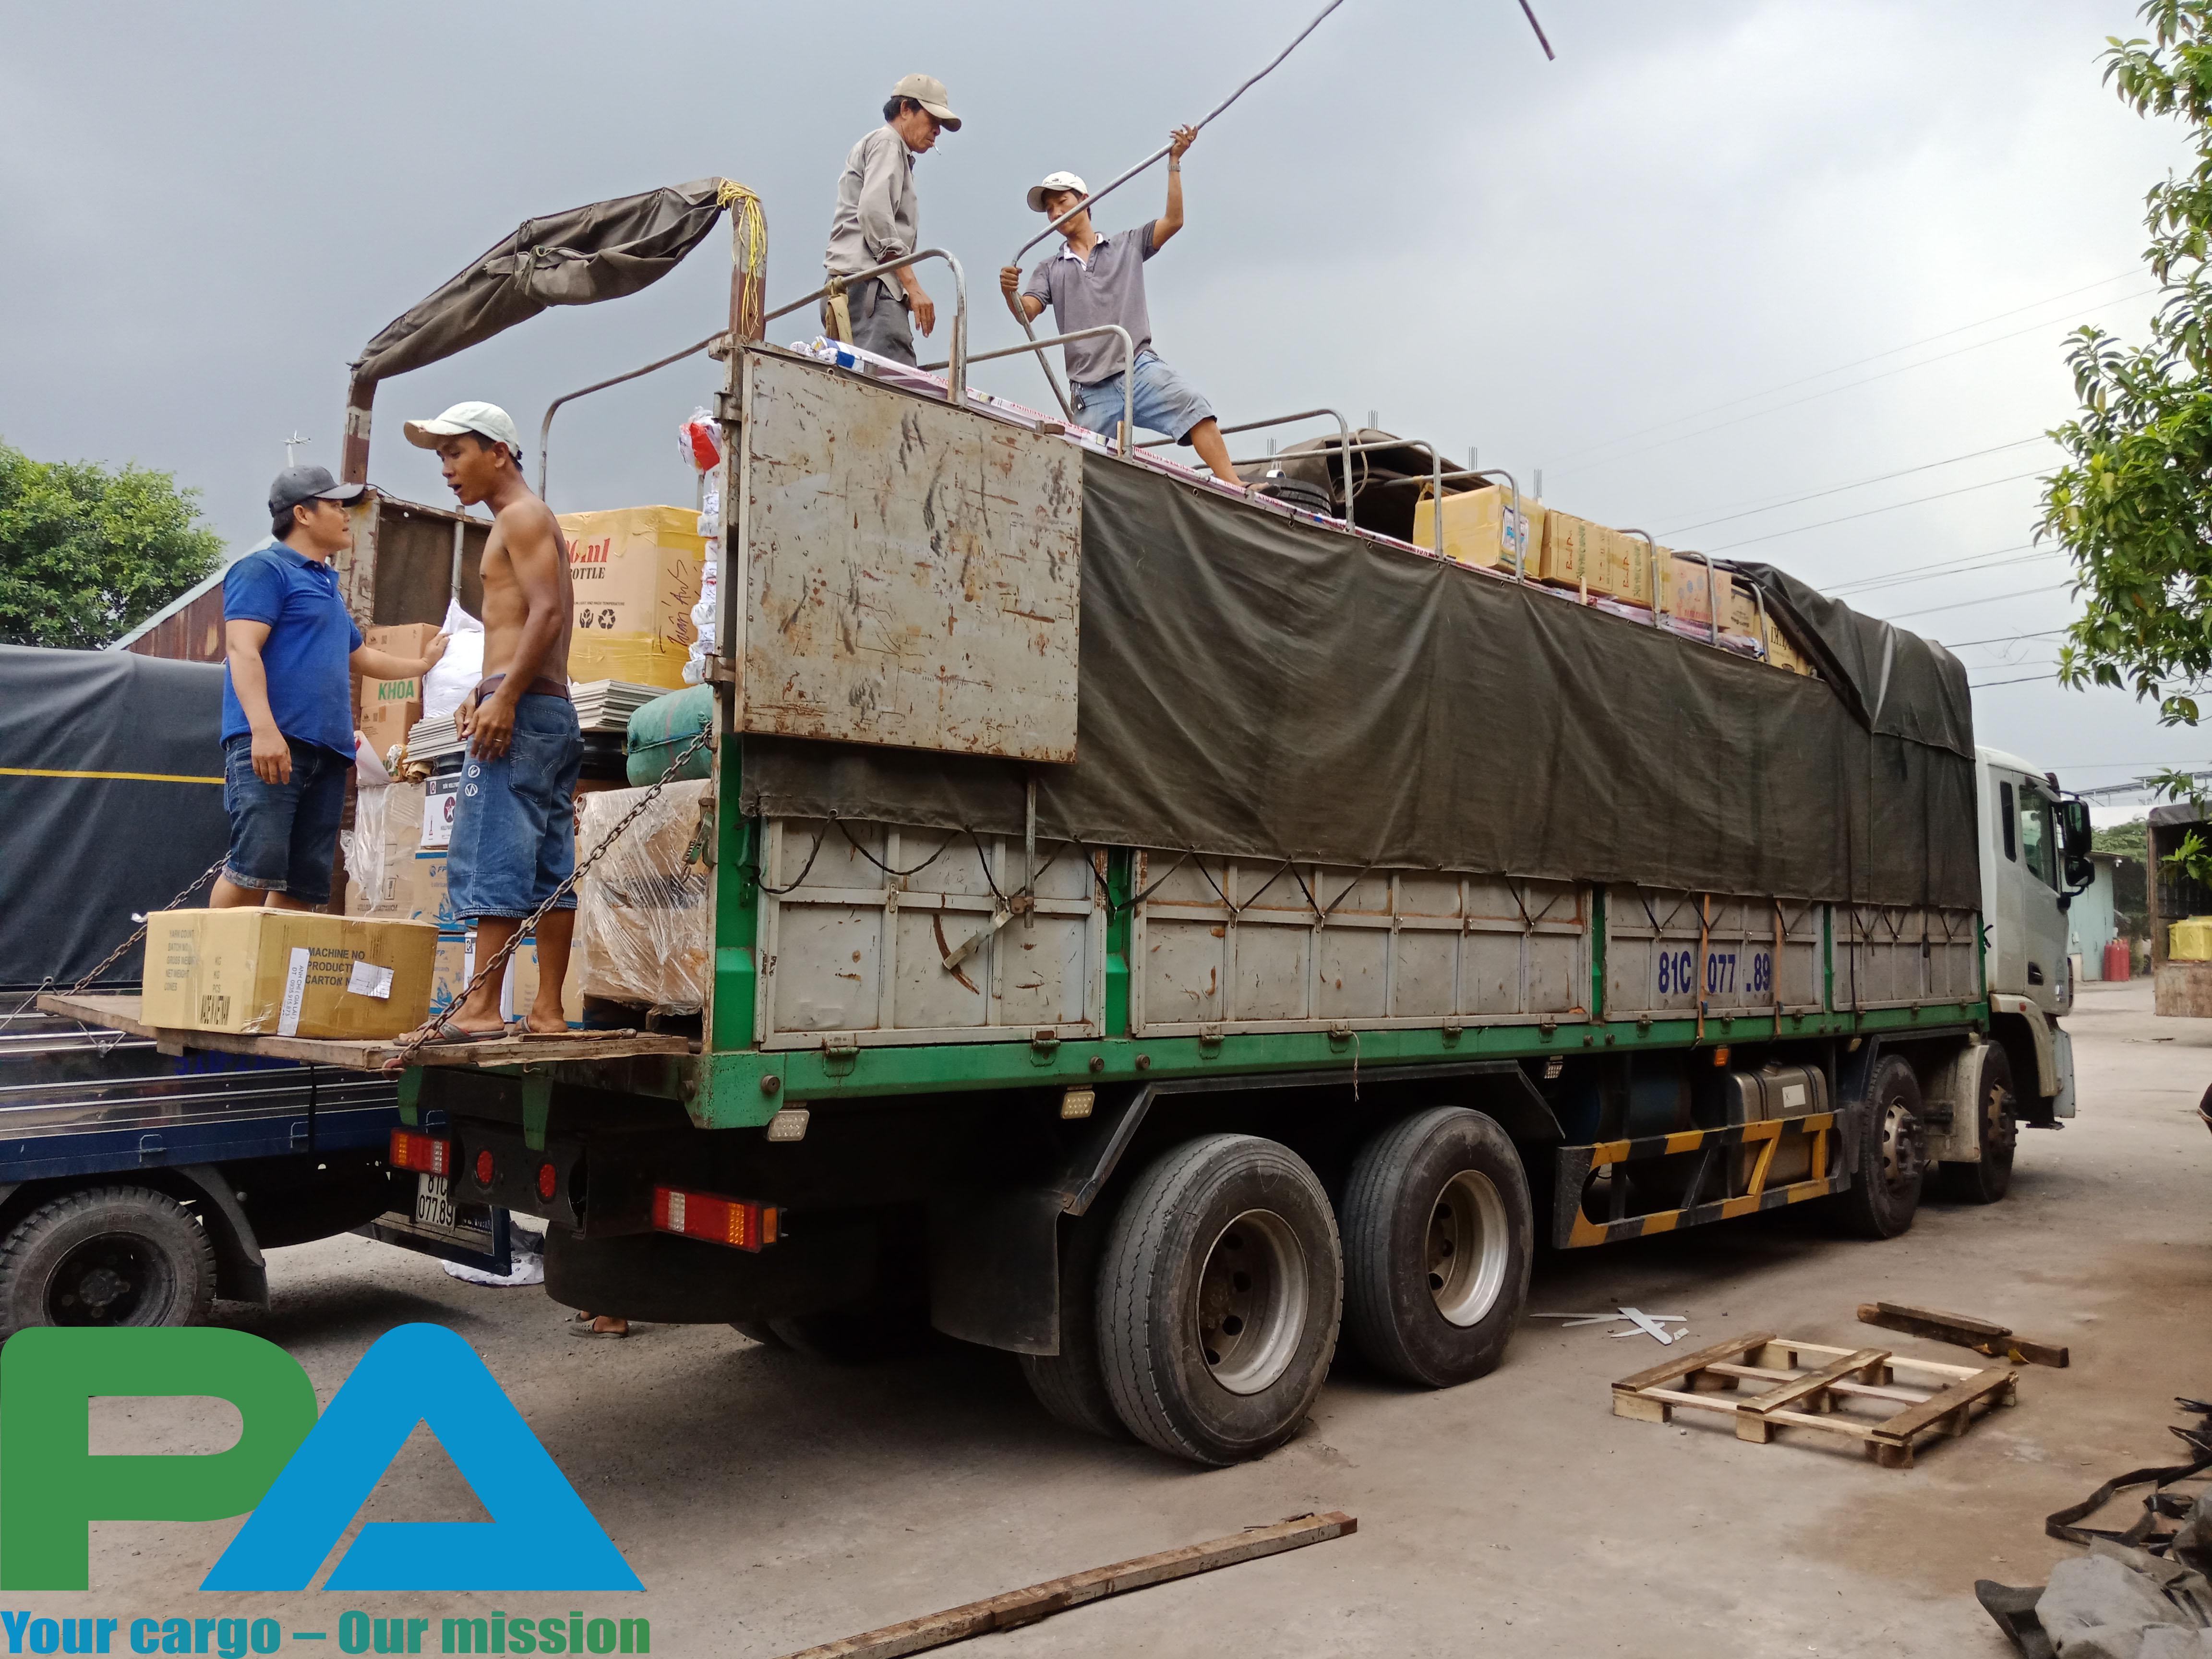 van chuyen hang tu binh duong di Phnom Penh